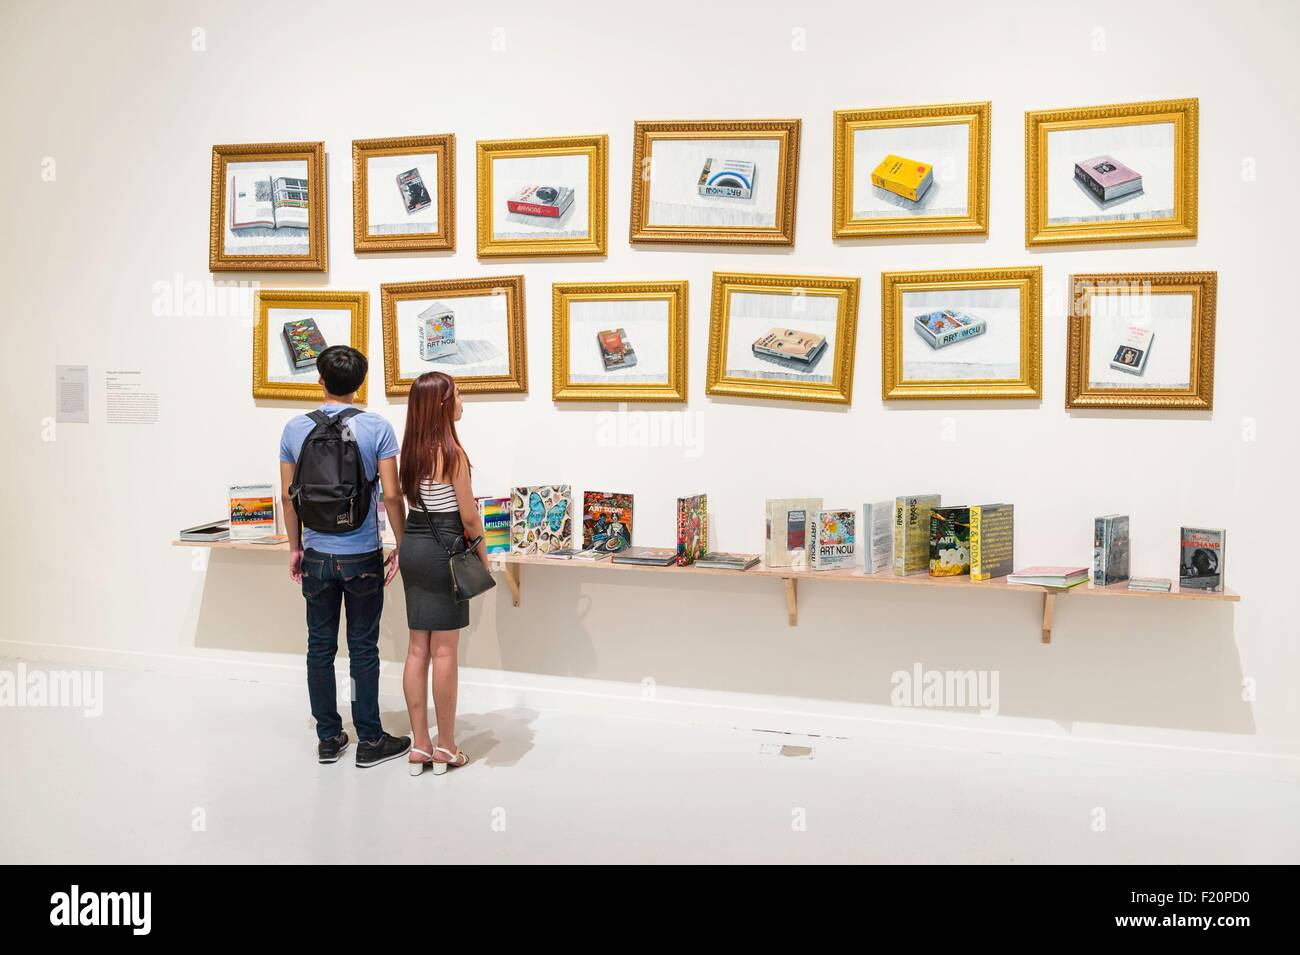 Singapore, Singapore Art Museum, Bookshelf by Torlarp Laroensook - Stock Image